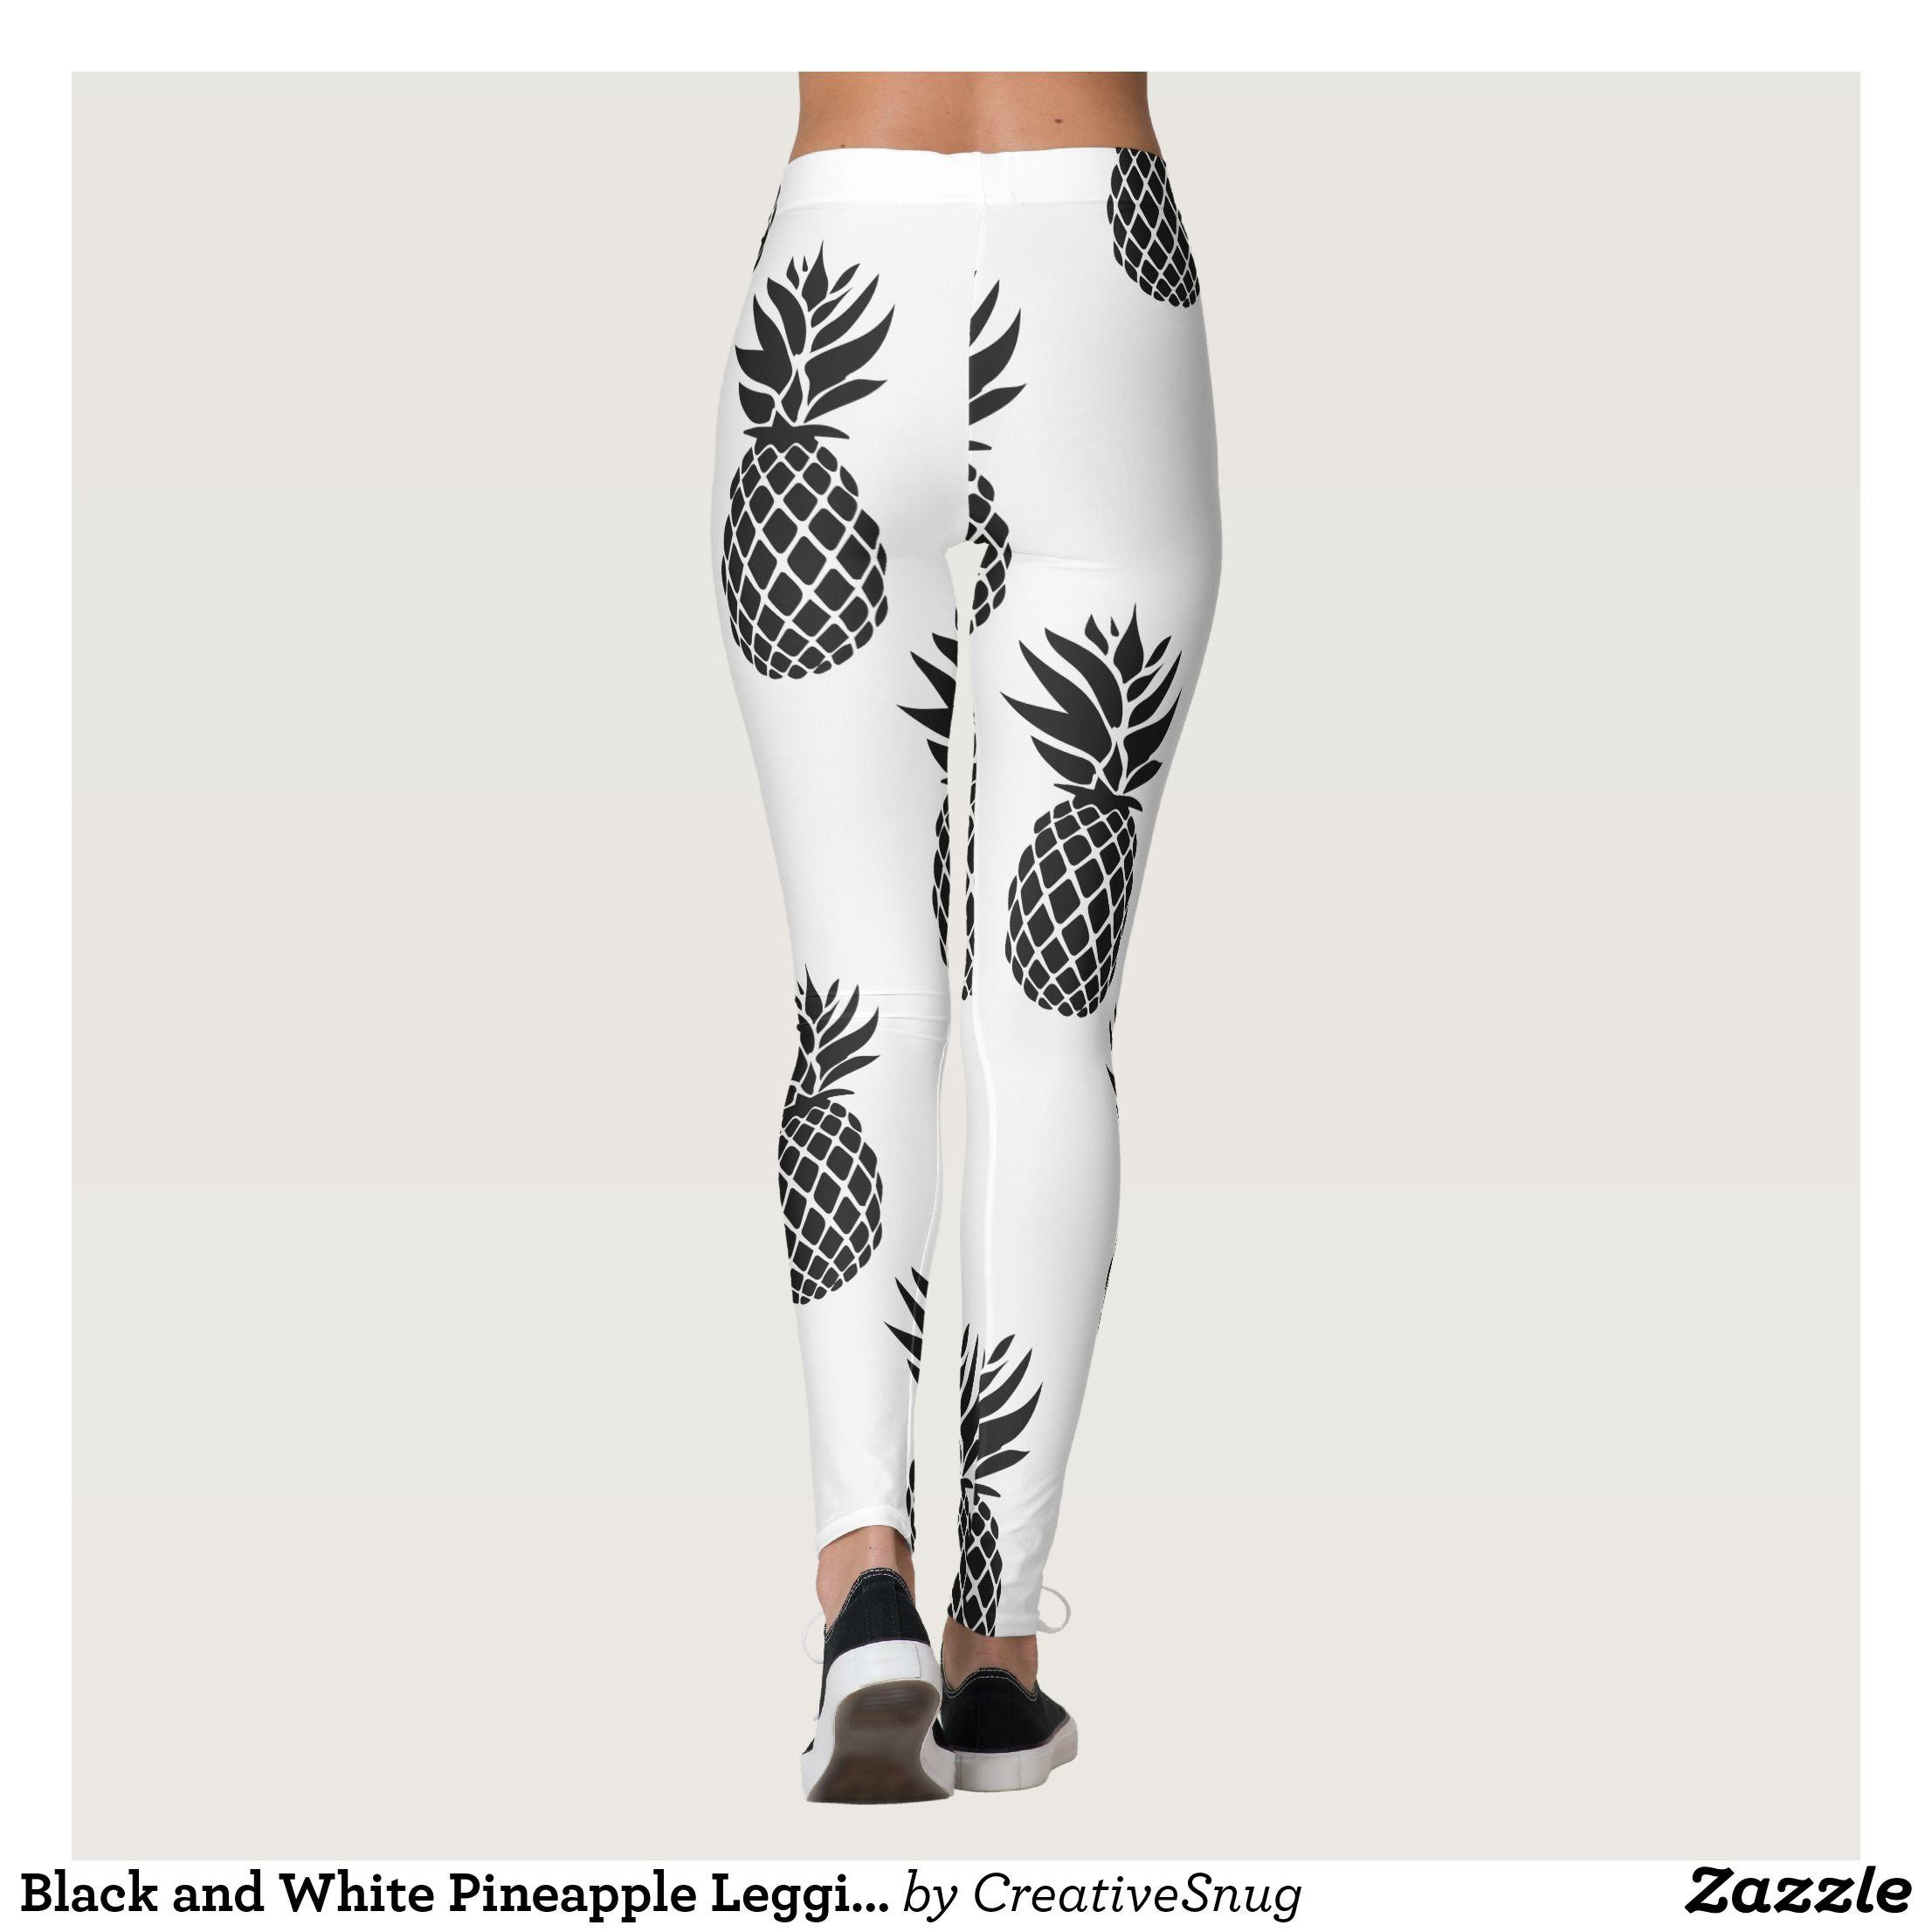 752d406fc7a4b Black and White Pineapple Leggins Leggings : Beautiful #Yoga Pants -  #Exercise Leggings and